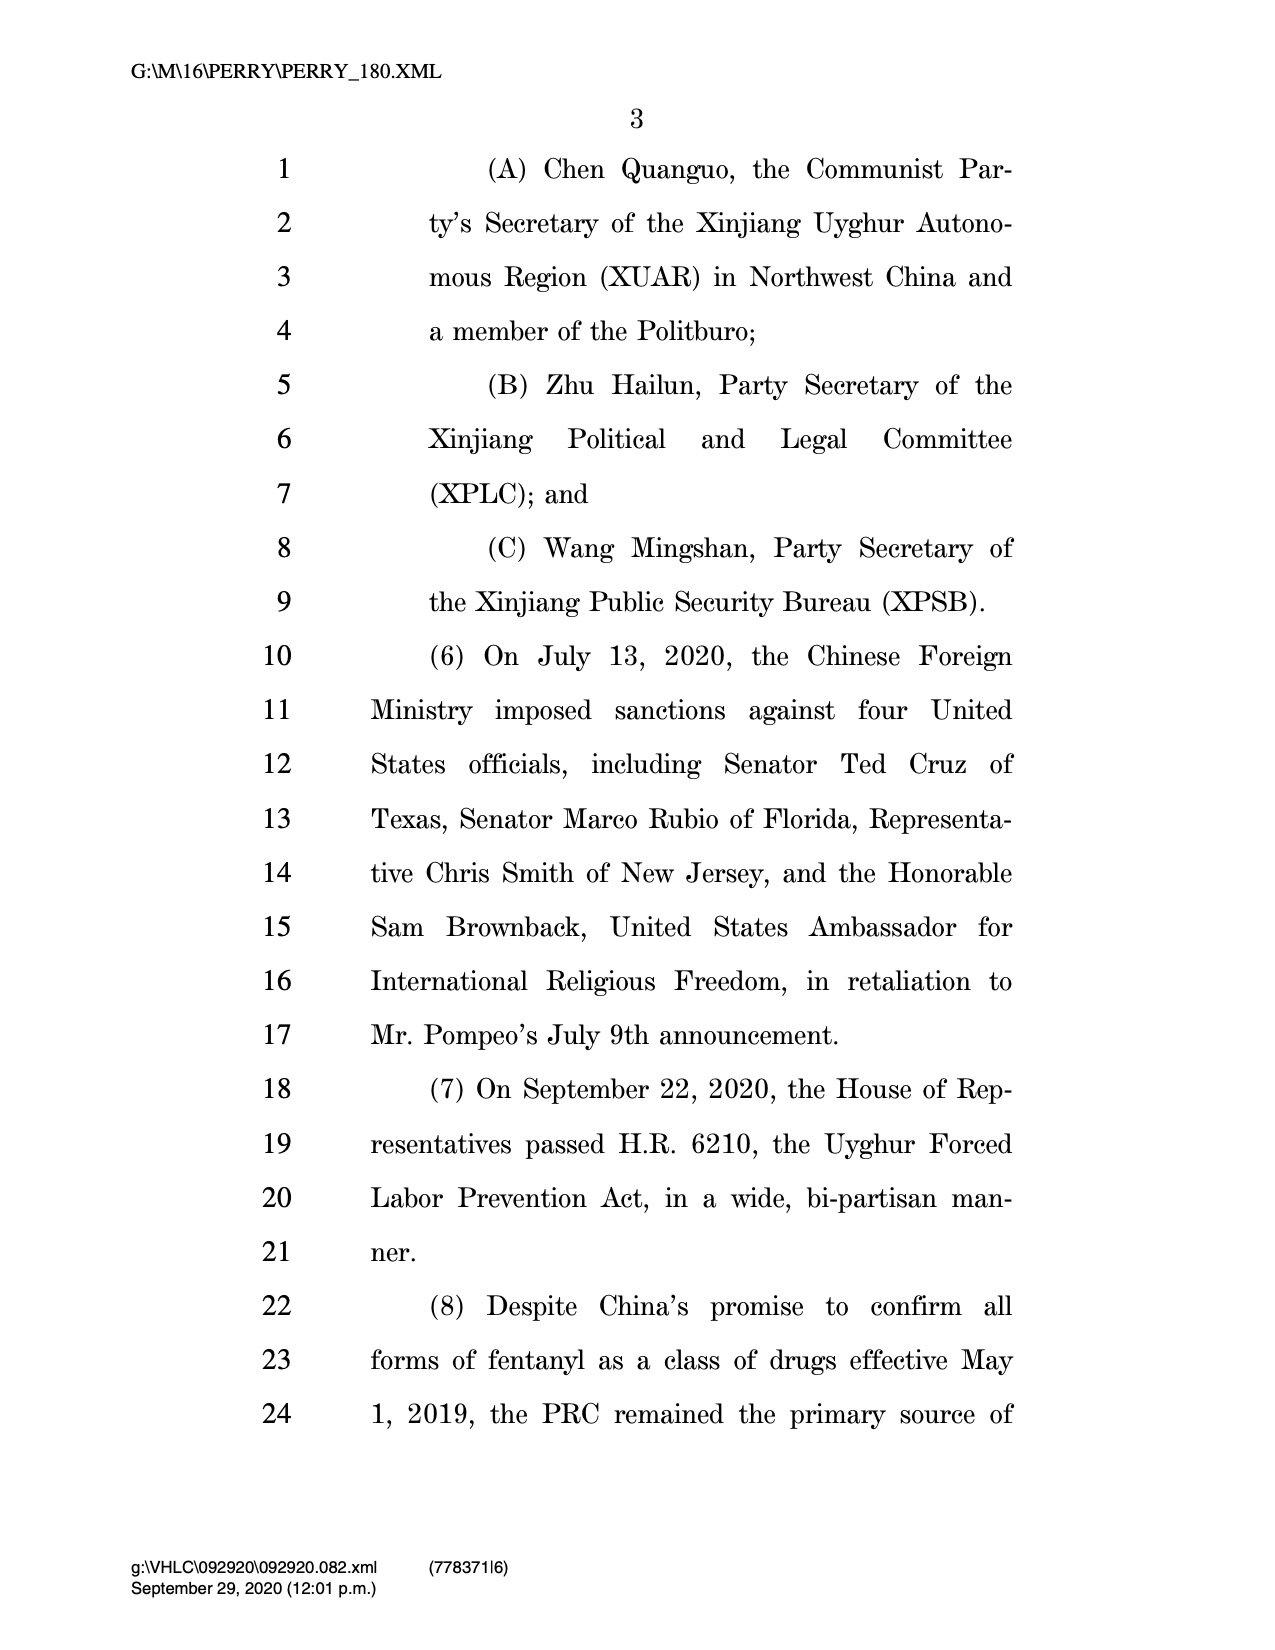 CCP as a TOC Bill - Final Edition 3.jpg